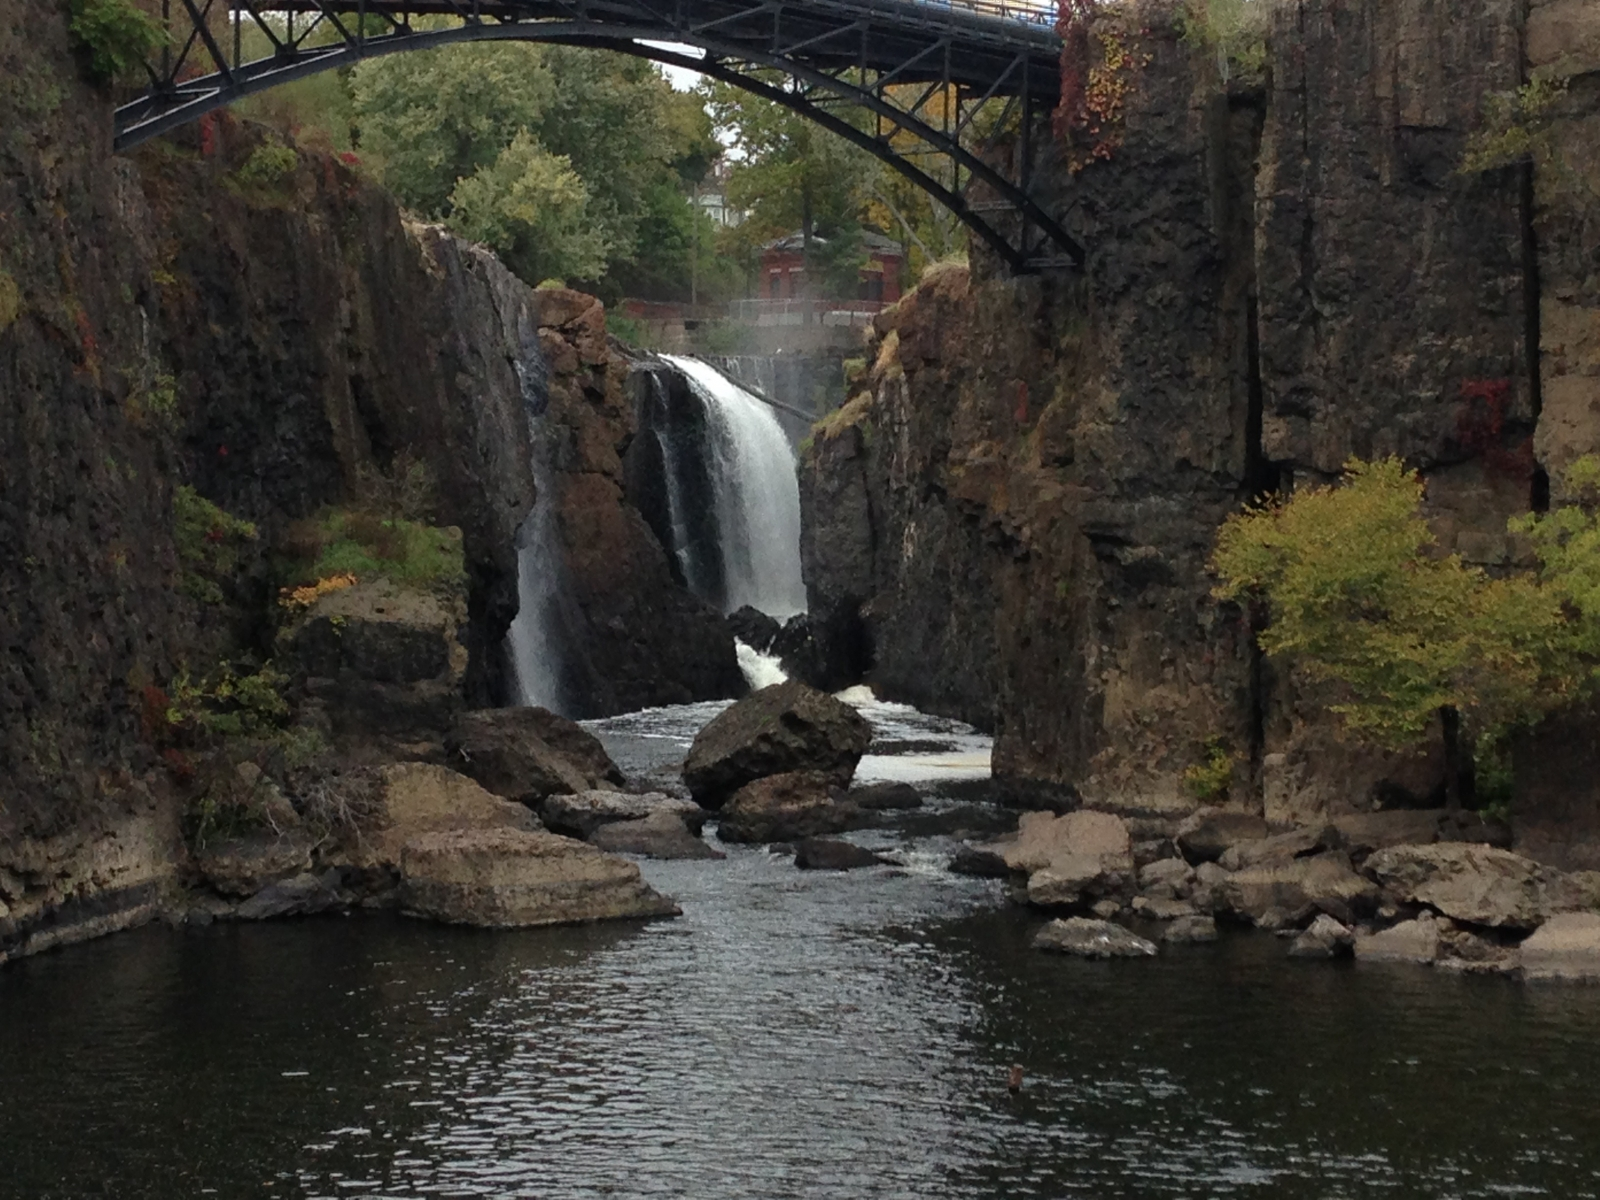 Waterfalls in New Jersey - NJ Family